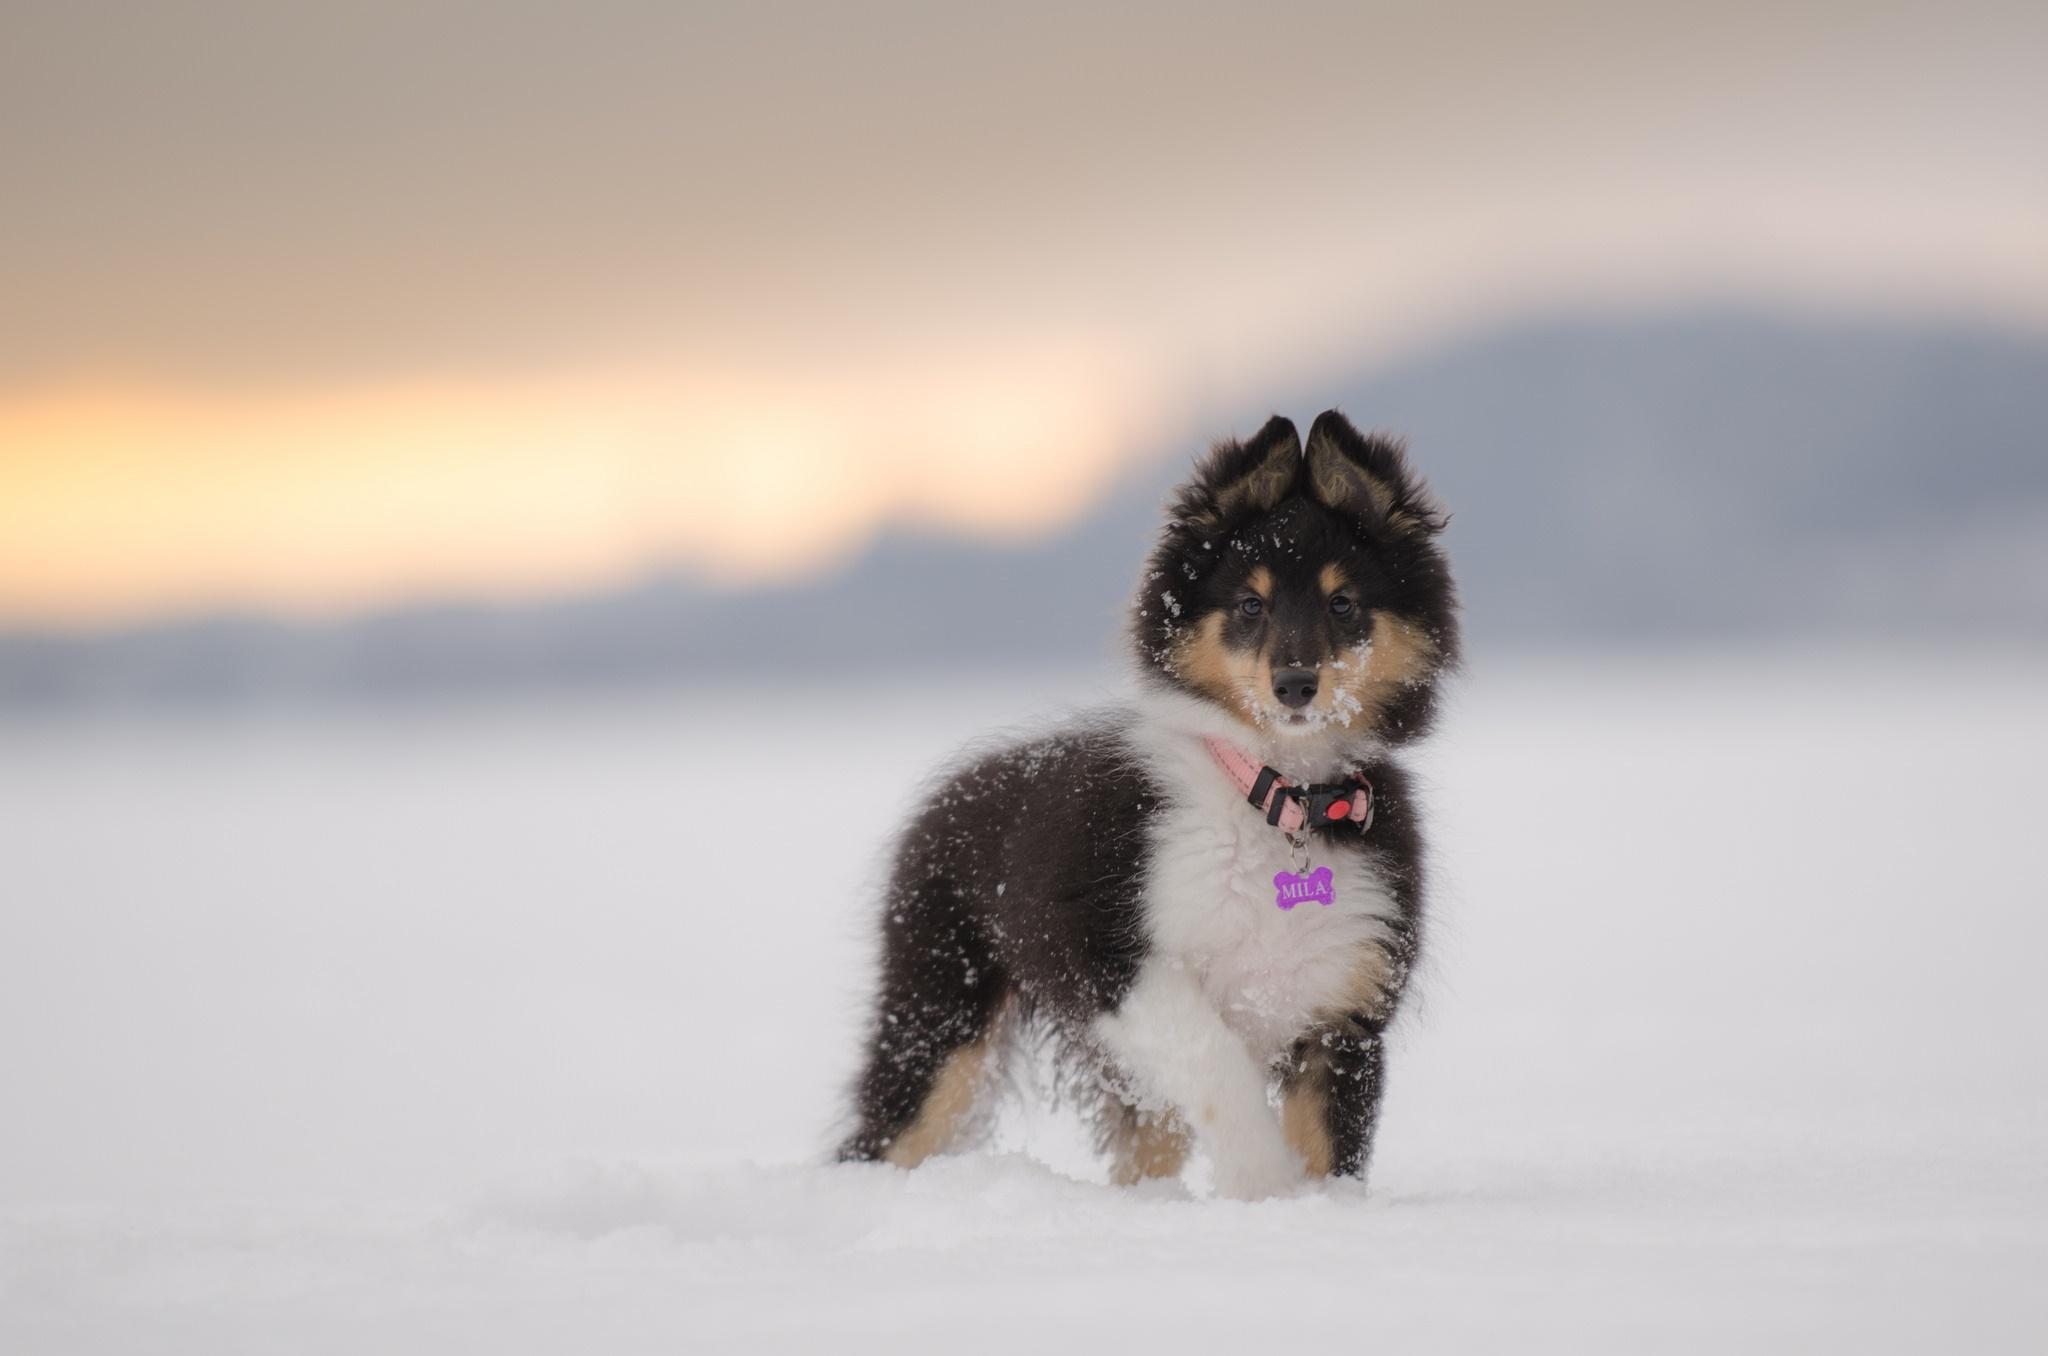 щенок снег puppy snow  № 2001806 без смс